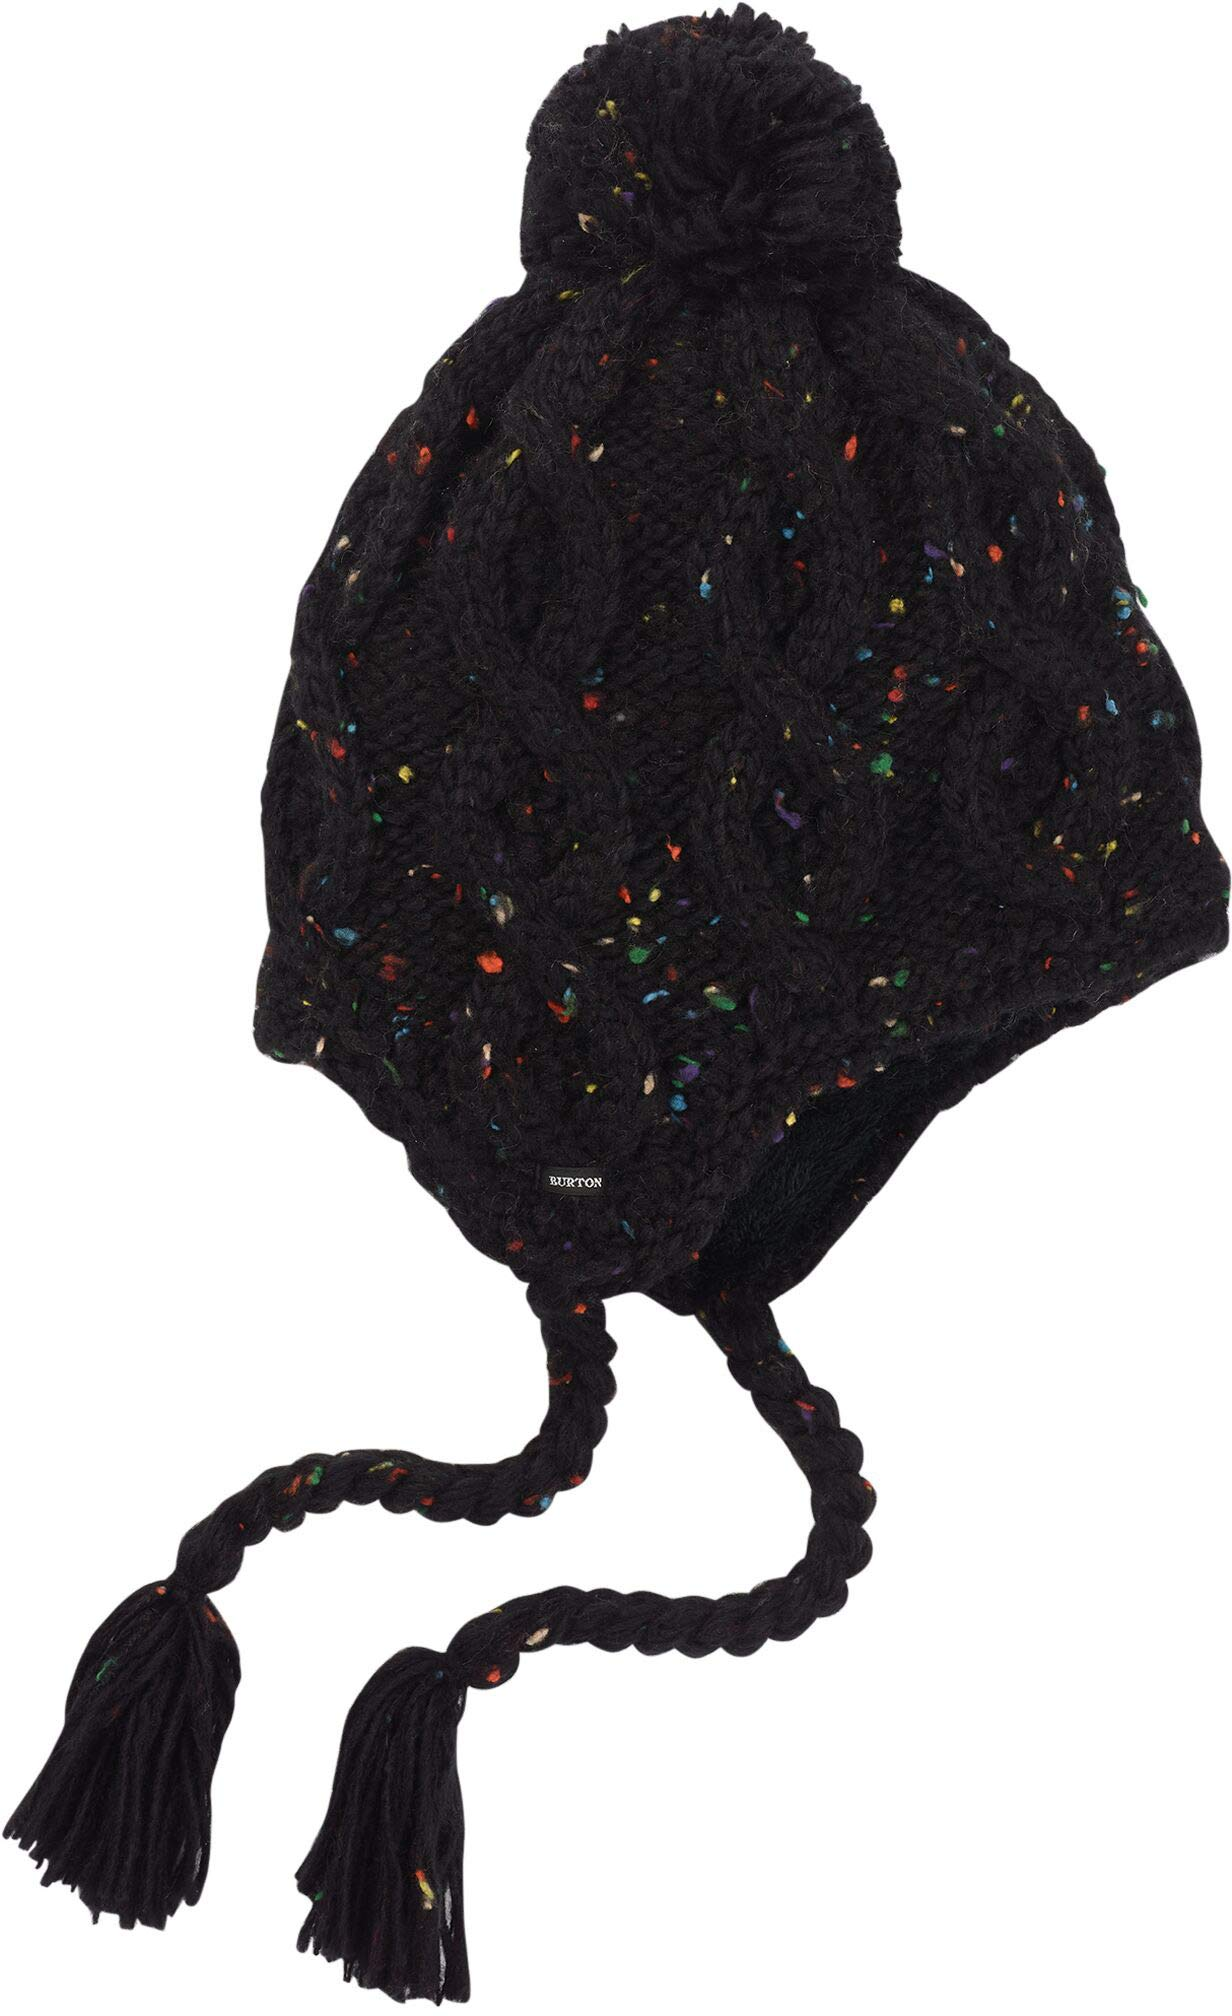 Burton Women's Chloe Ear Flap Beanie, True Black, One Size by Burton